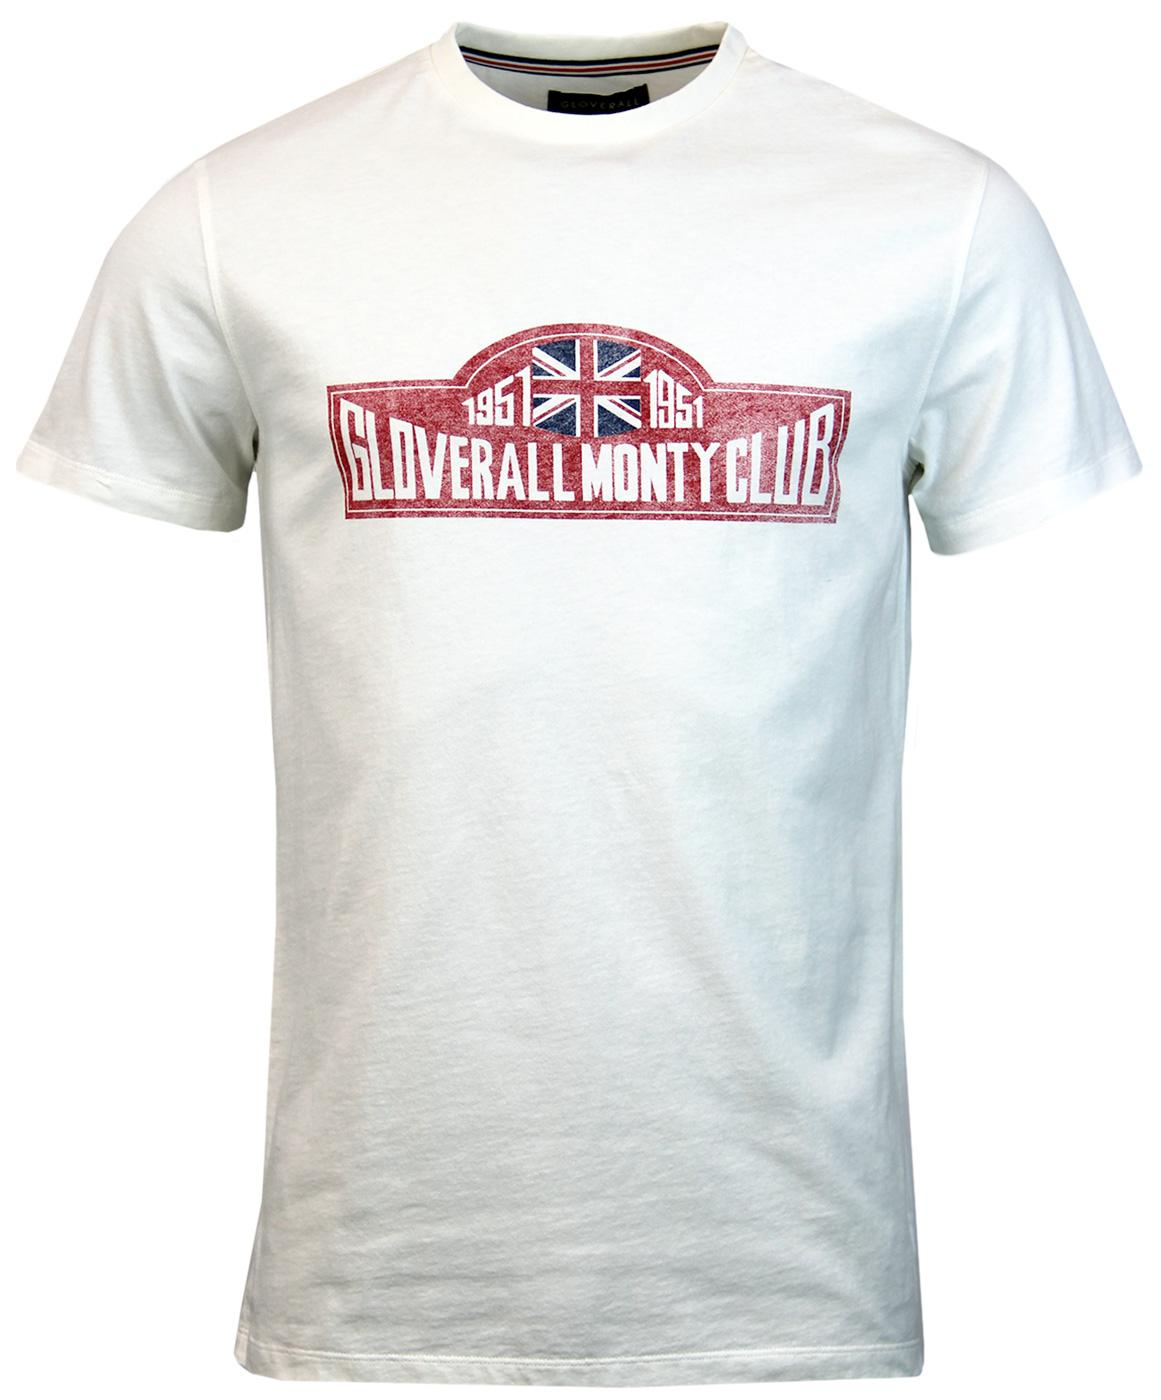 GLOVERALL Retro Monty Club Print Jersey T-Shirt